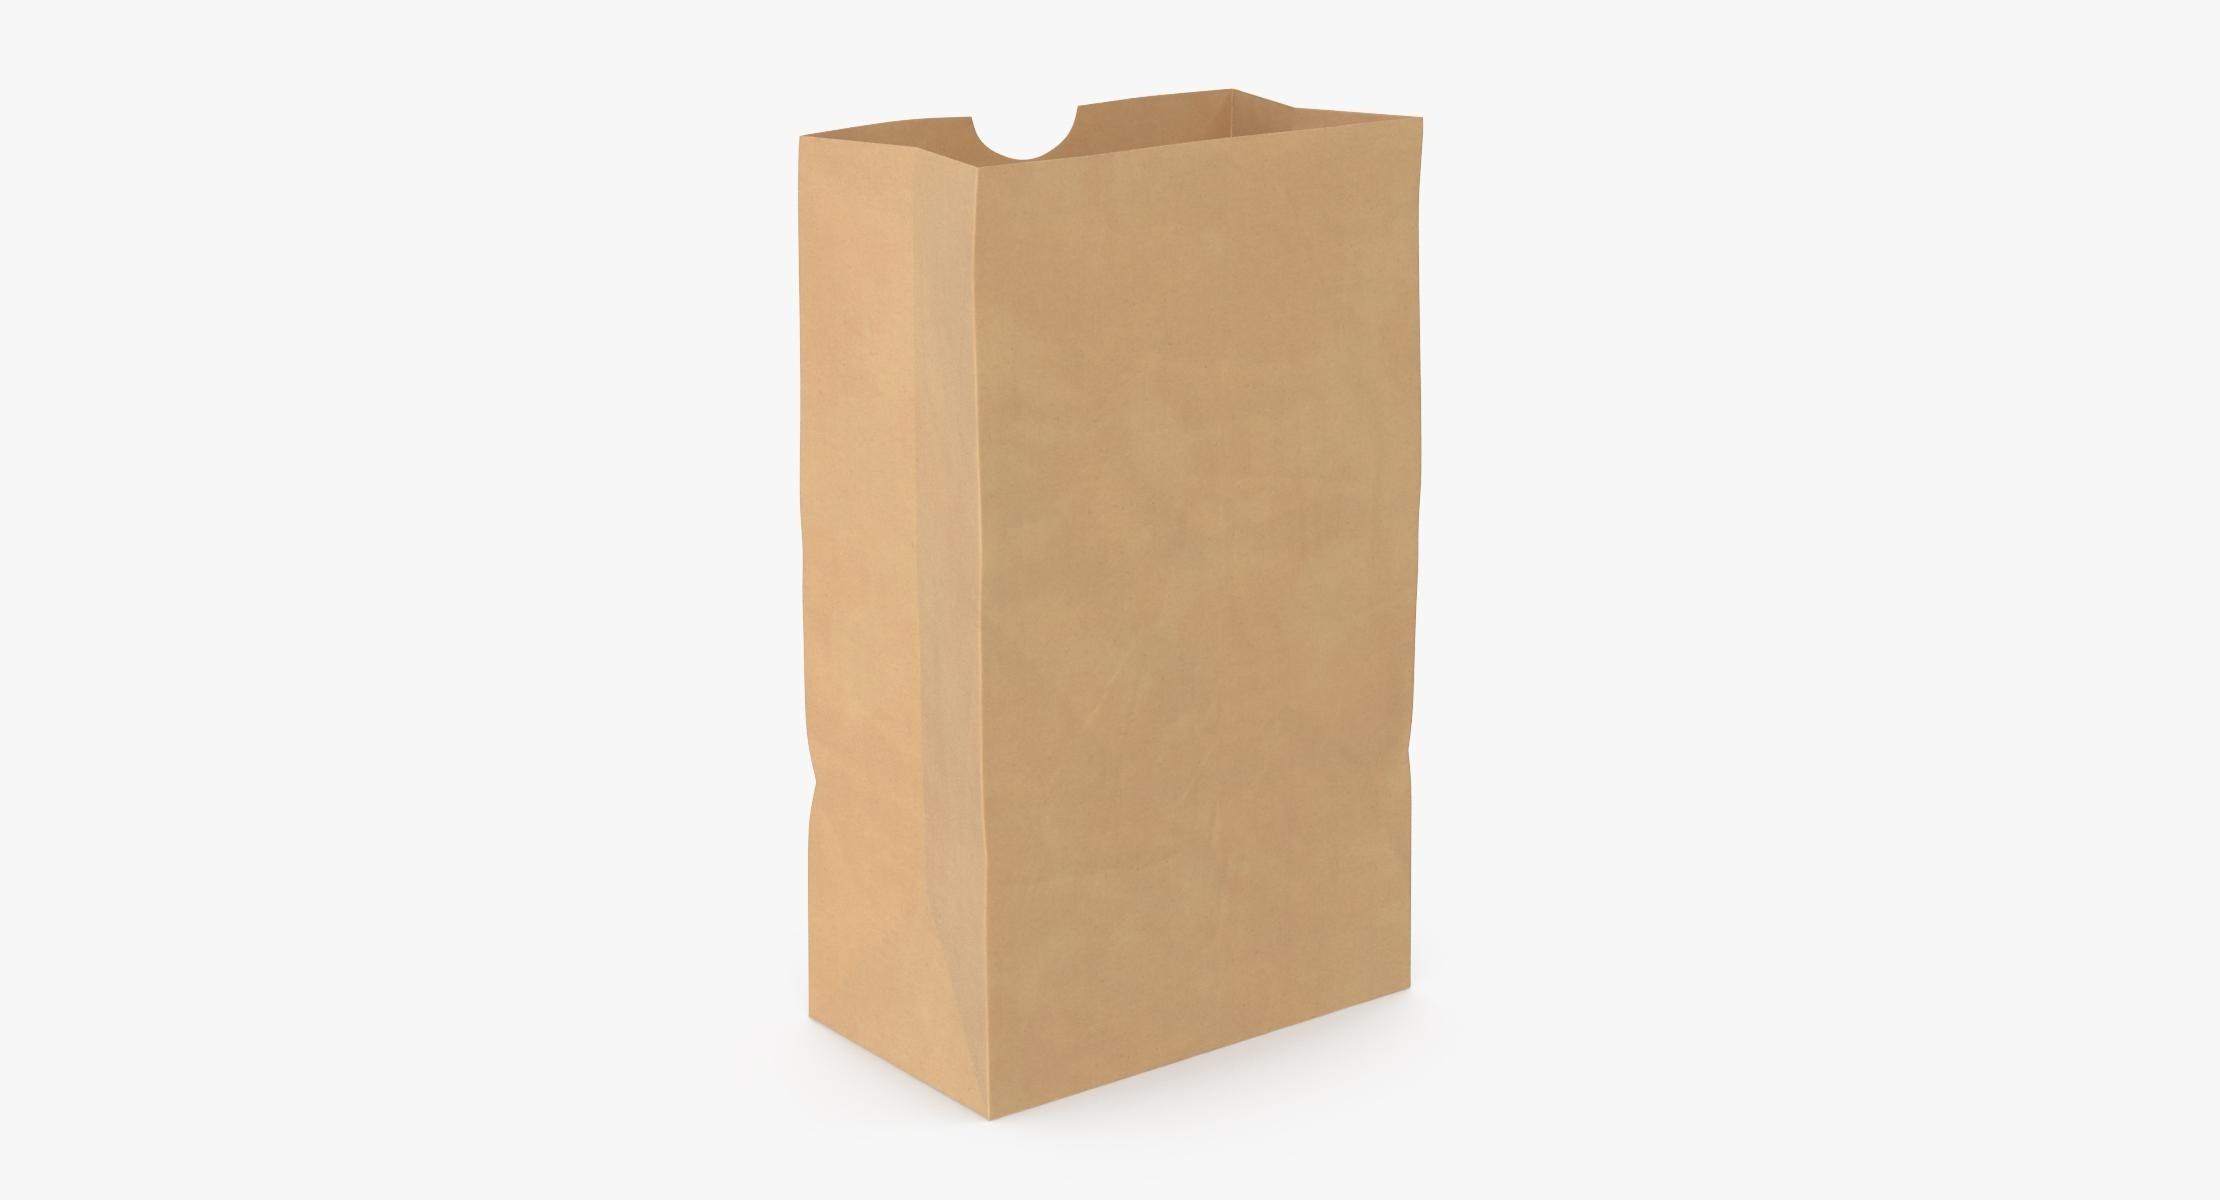 Grocery Bag No Handle Mockup Medium Open - reel 1